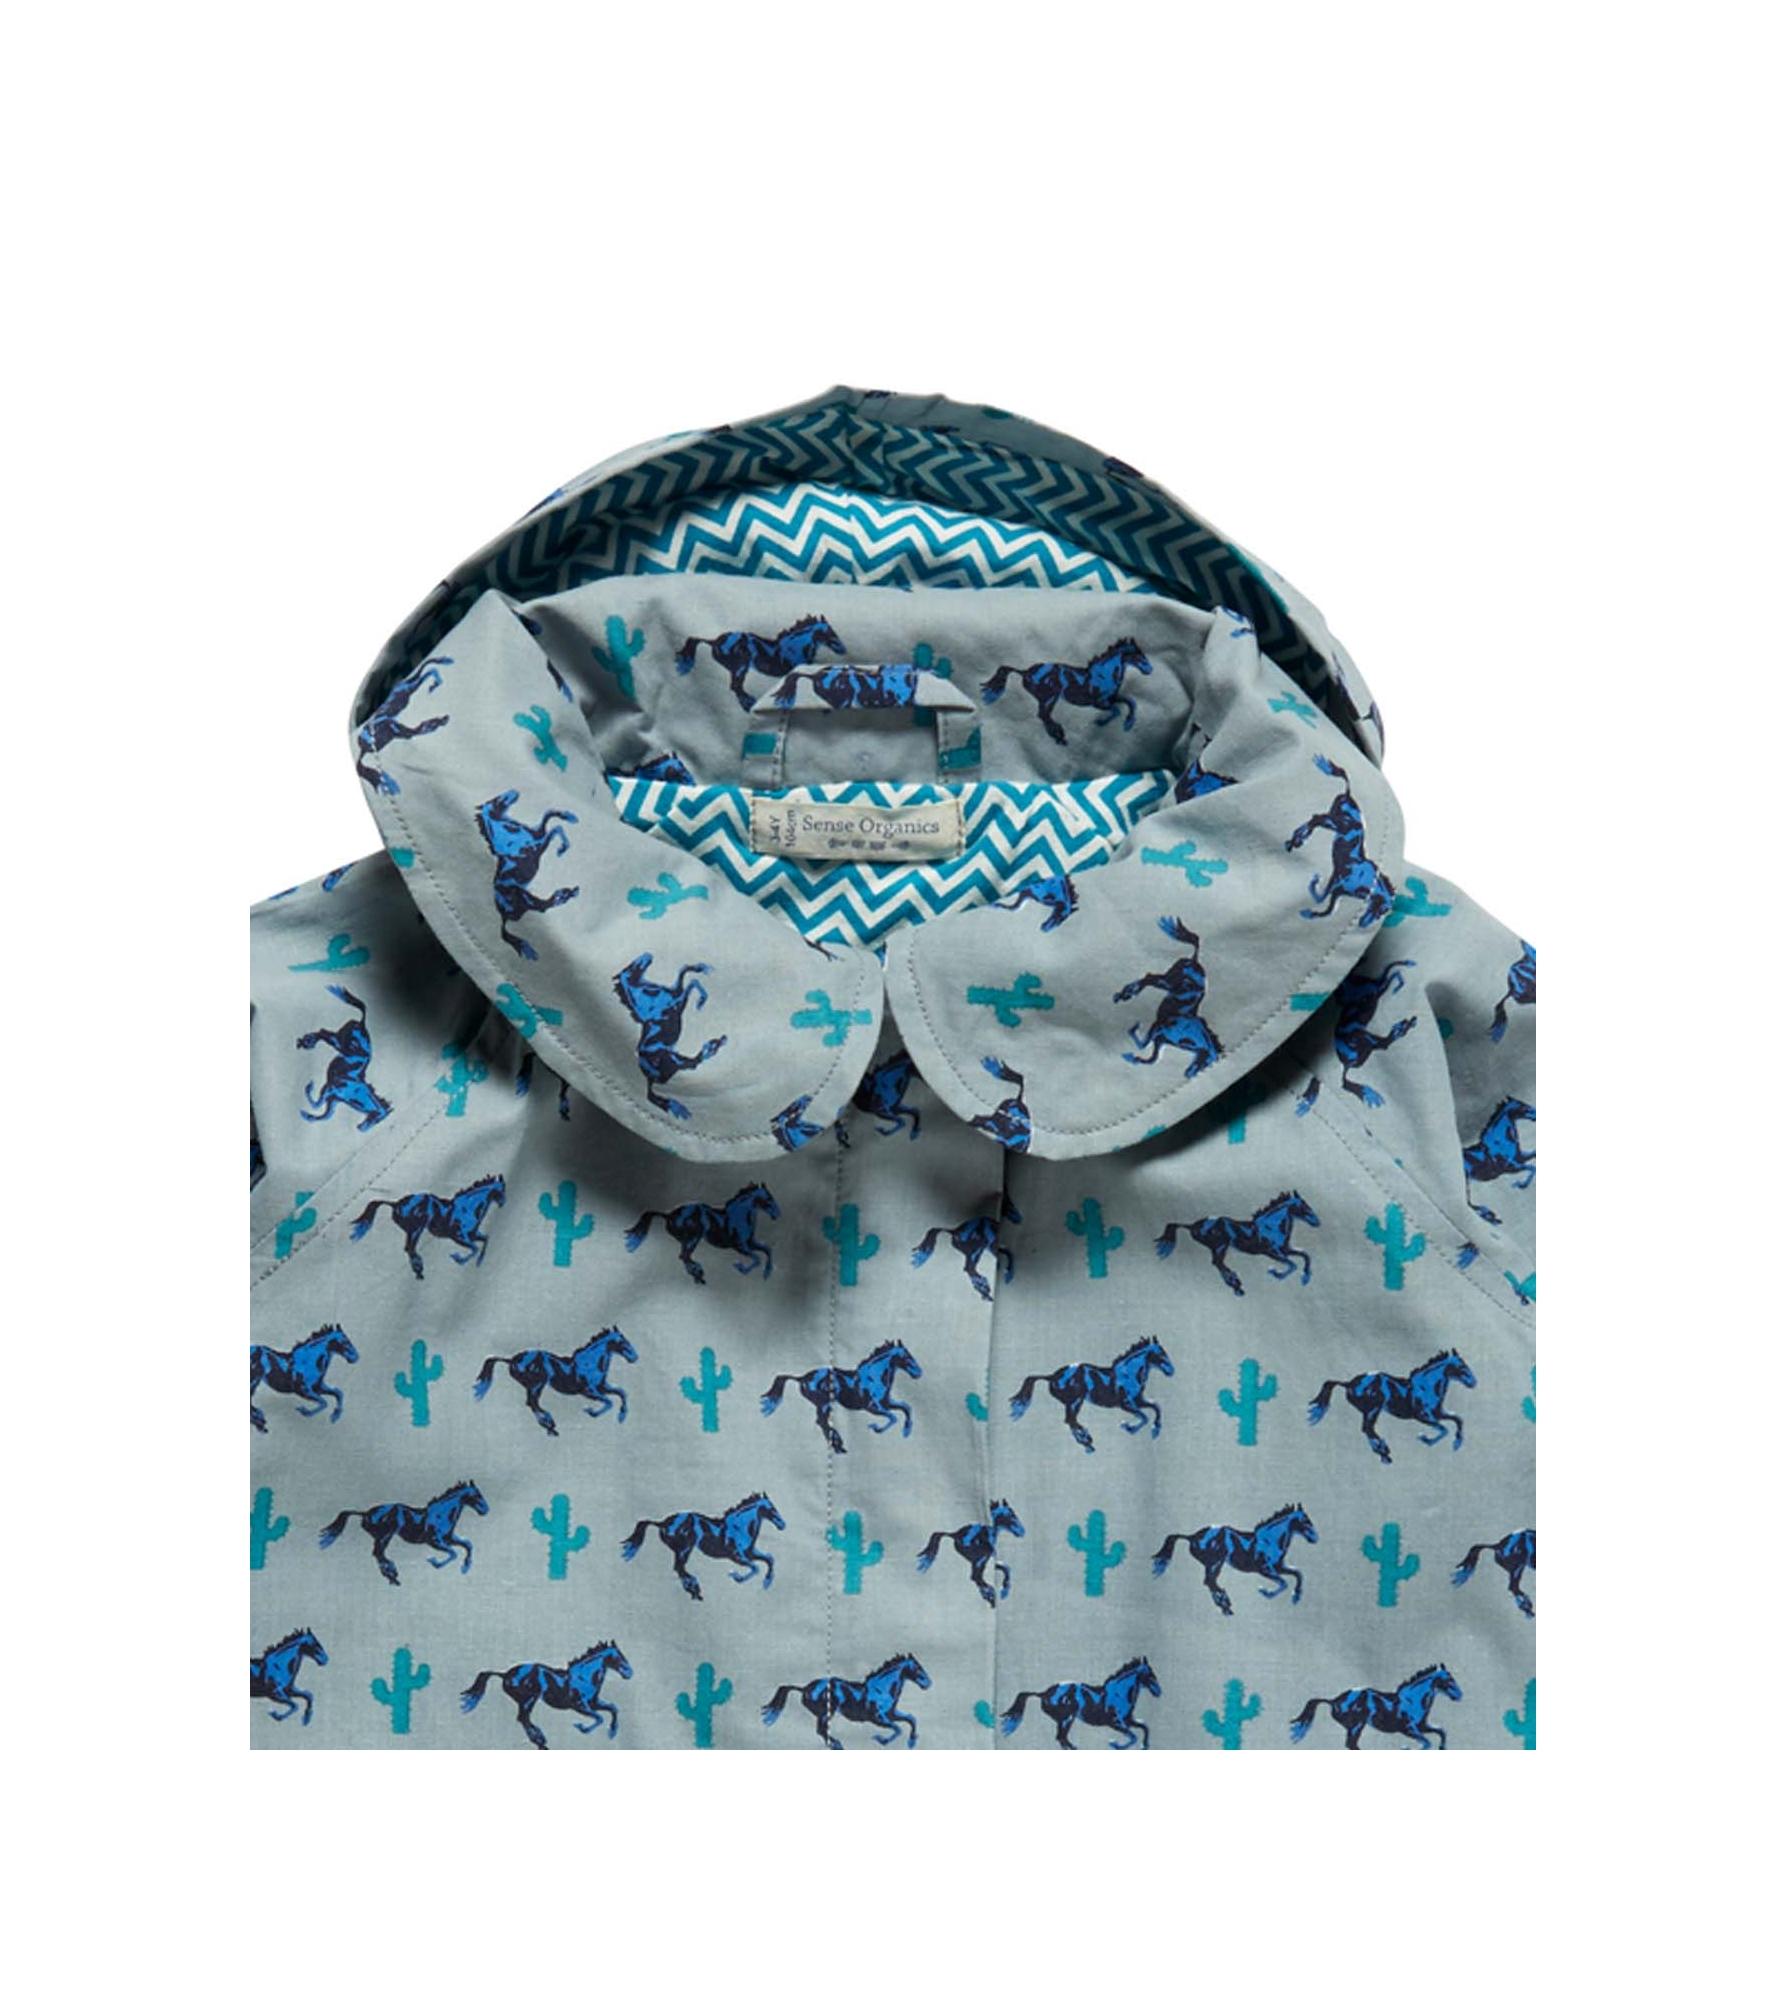 1711547-sense-organics-Lou-jacket-horse-print-detail-one.jpg